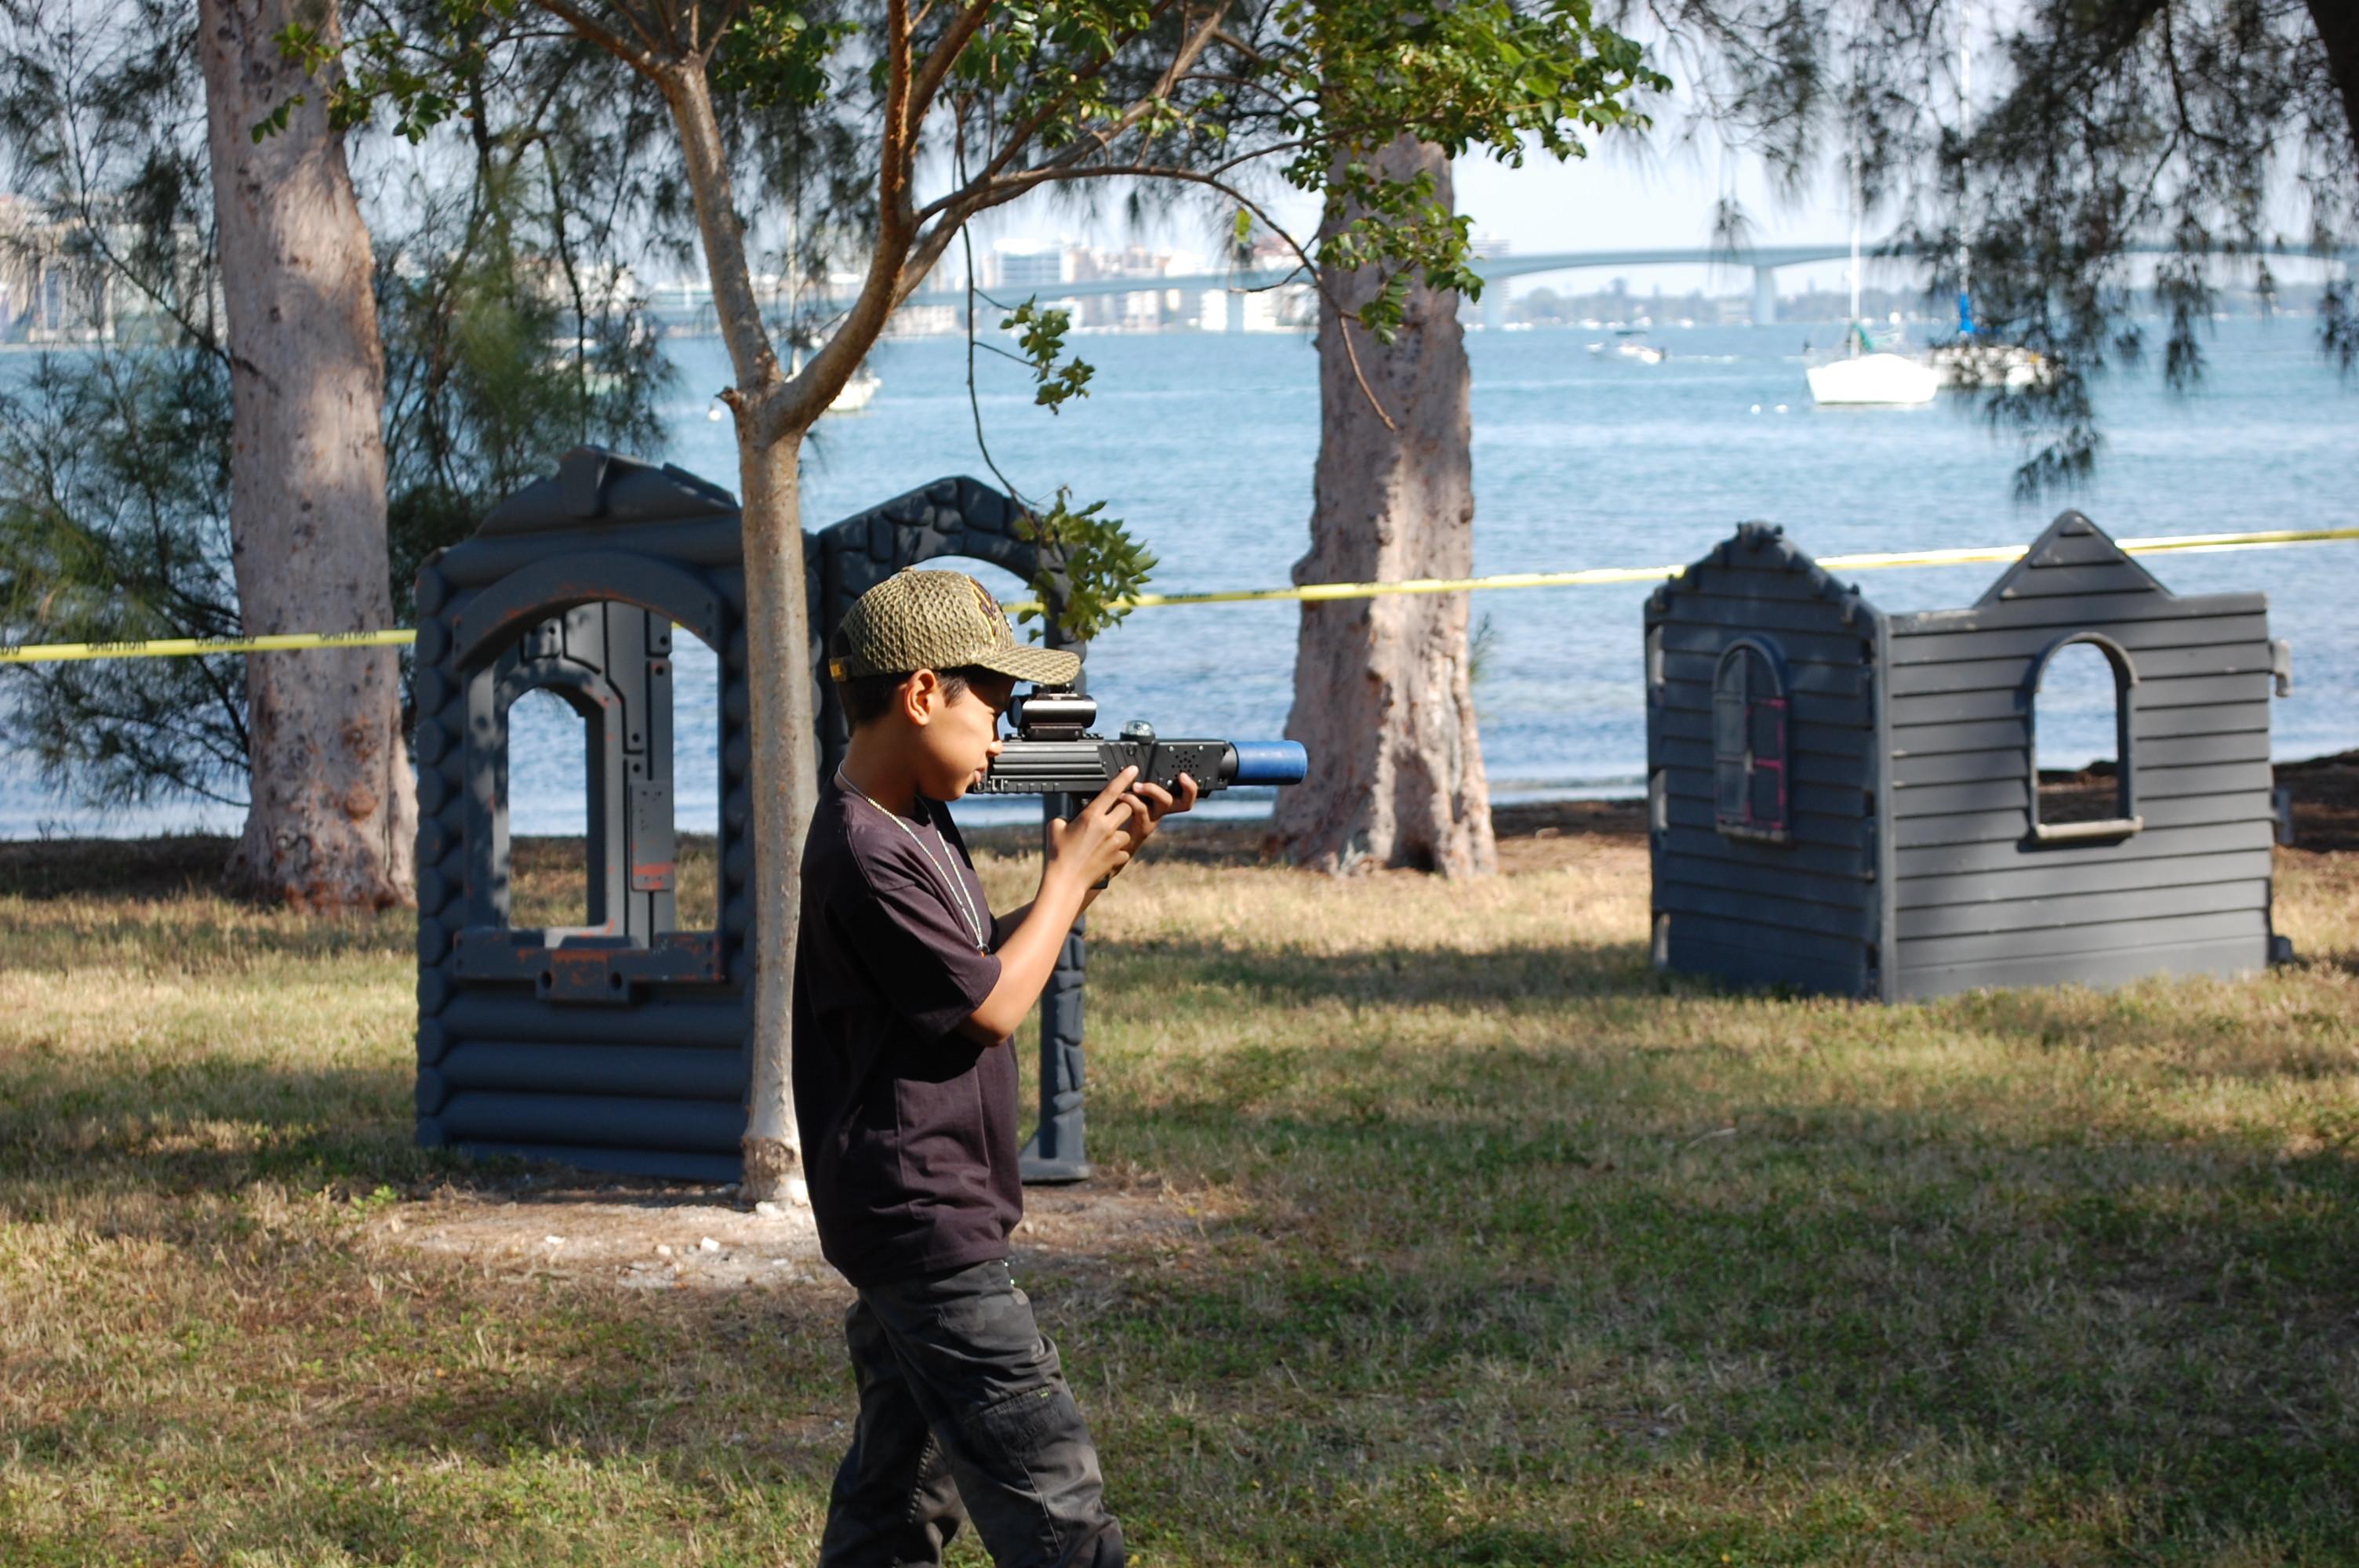 Mobile Laser Tag in Okeechobee,FL